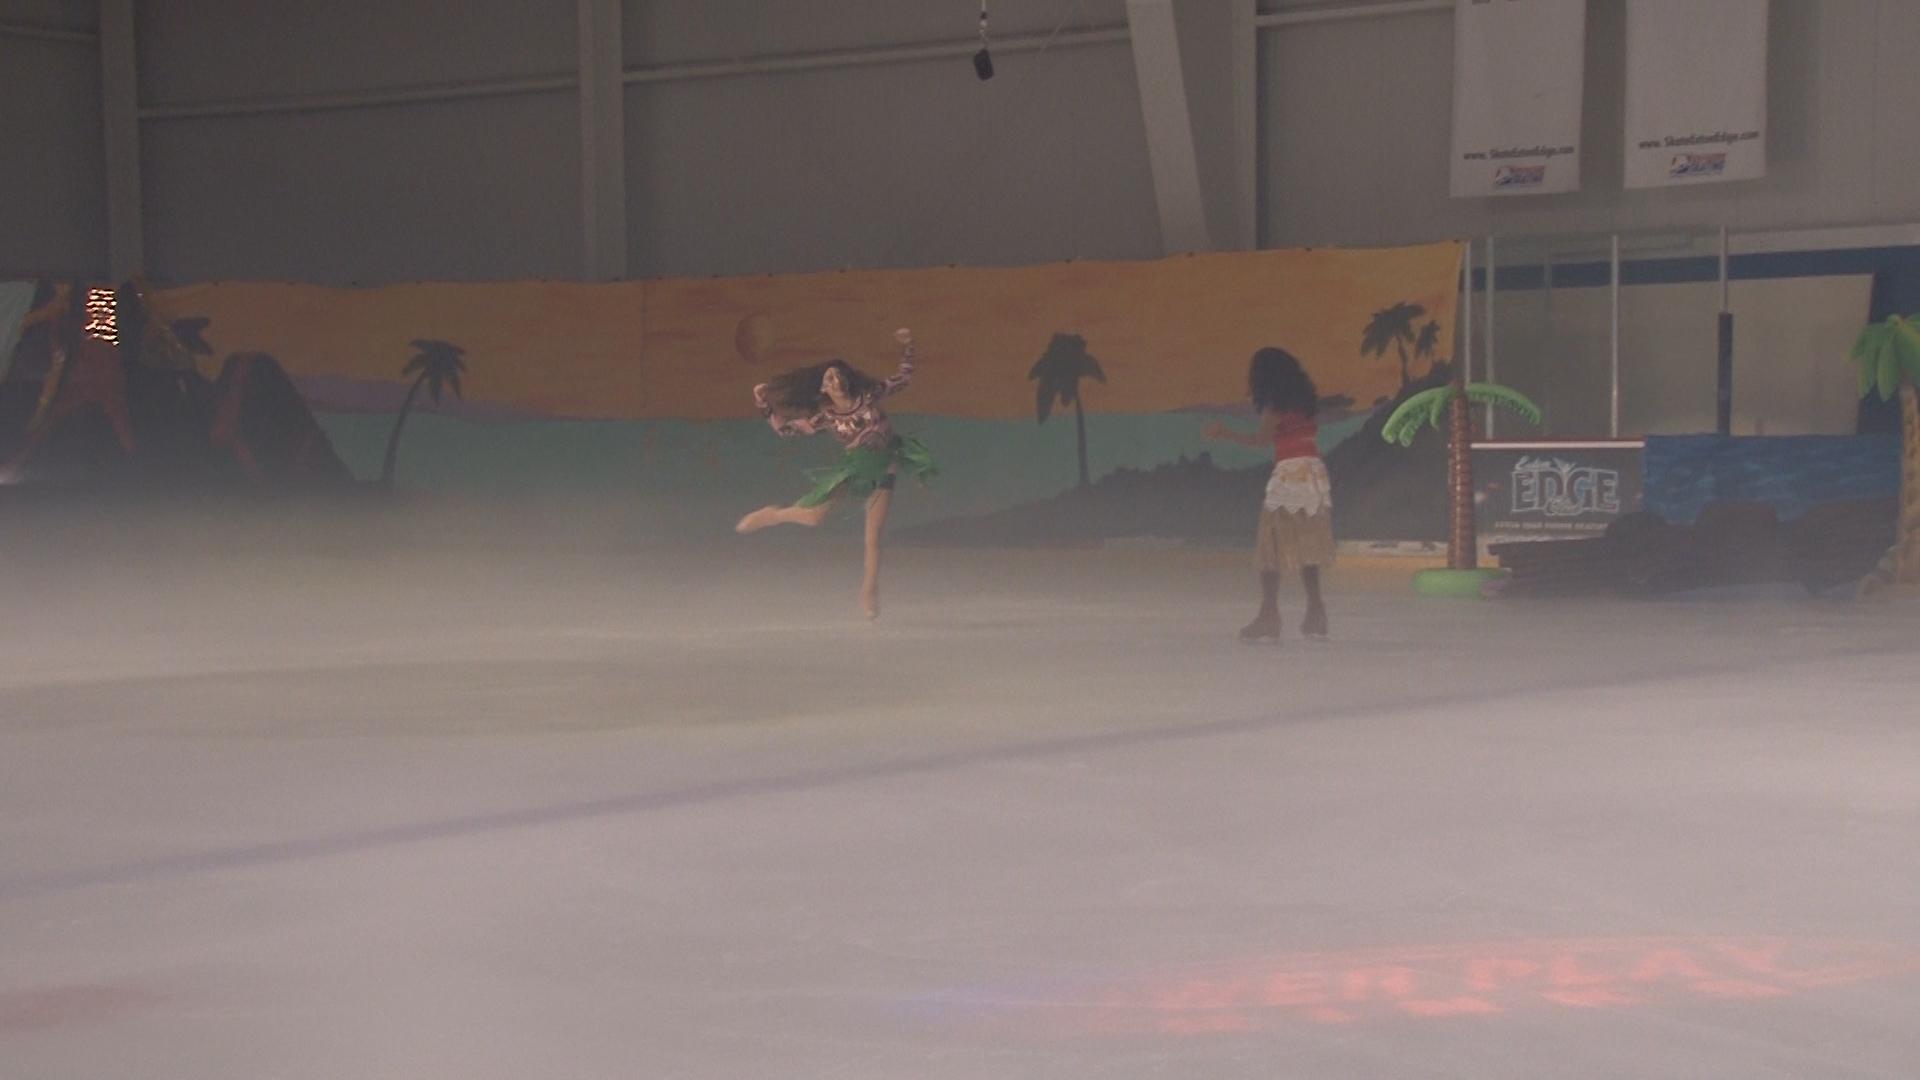 Power Play Maui Skate on Ice 071417.00_32_45_19.Still054.jpg